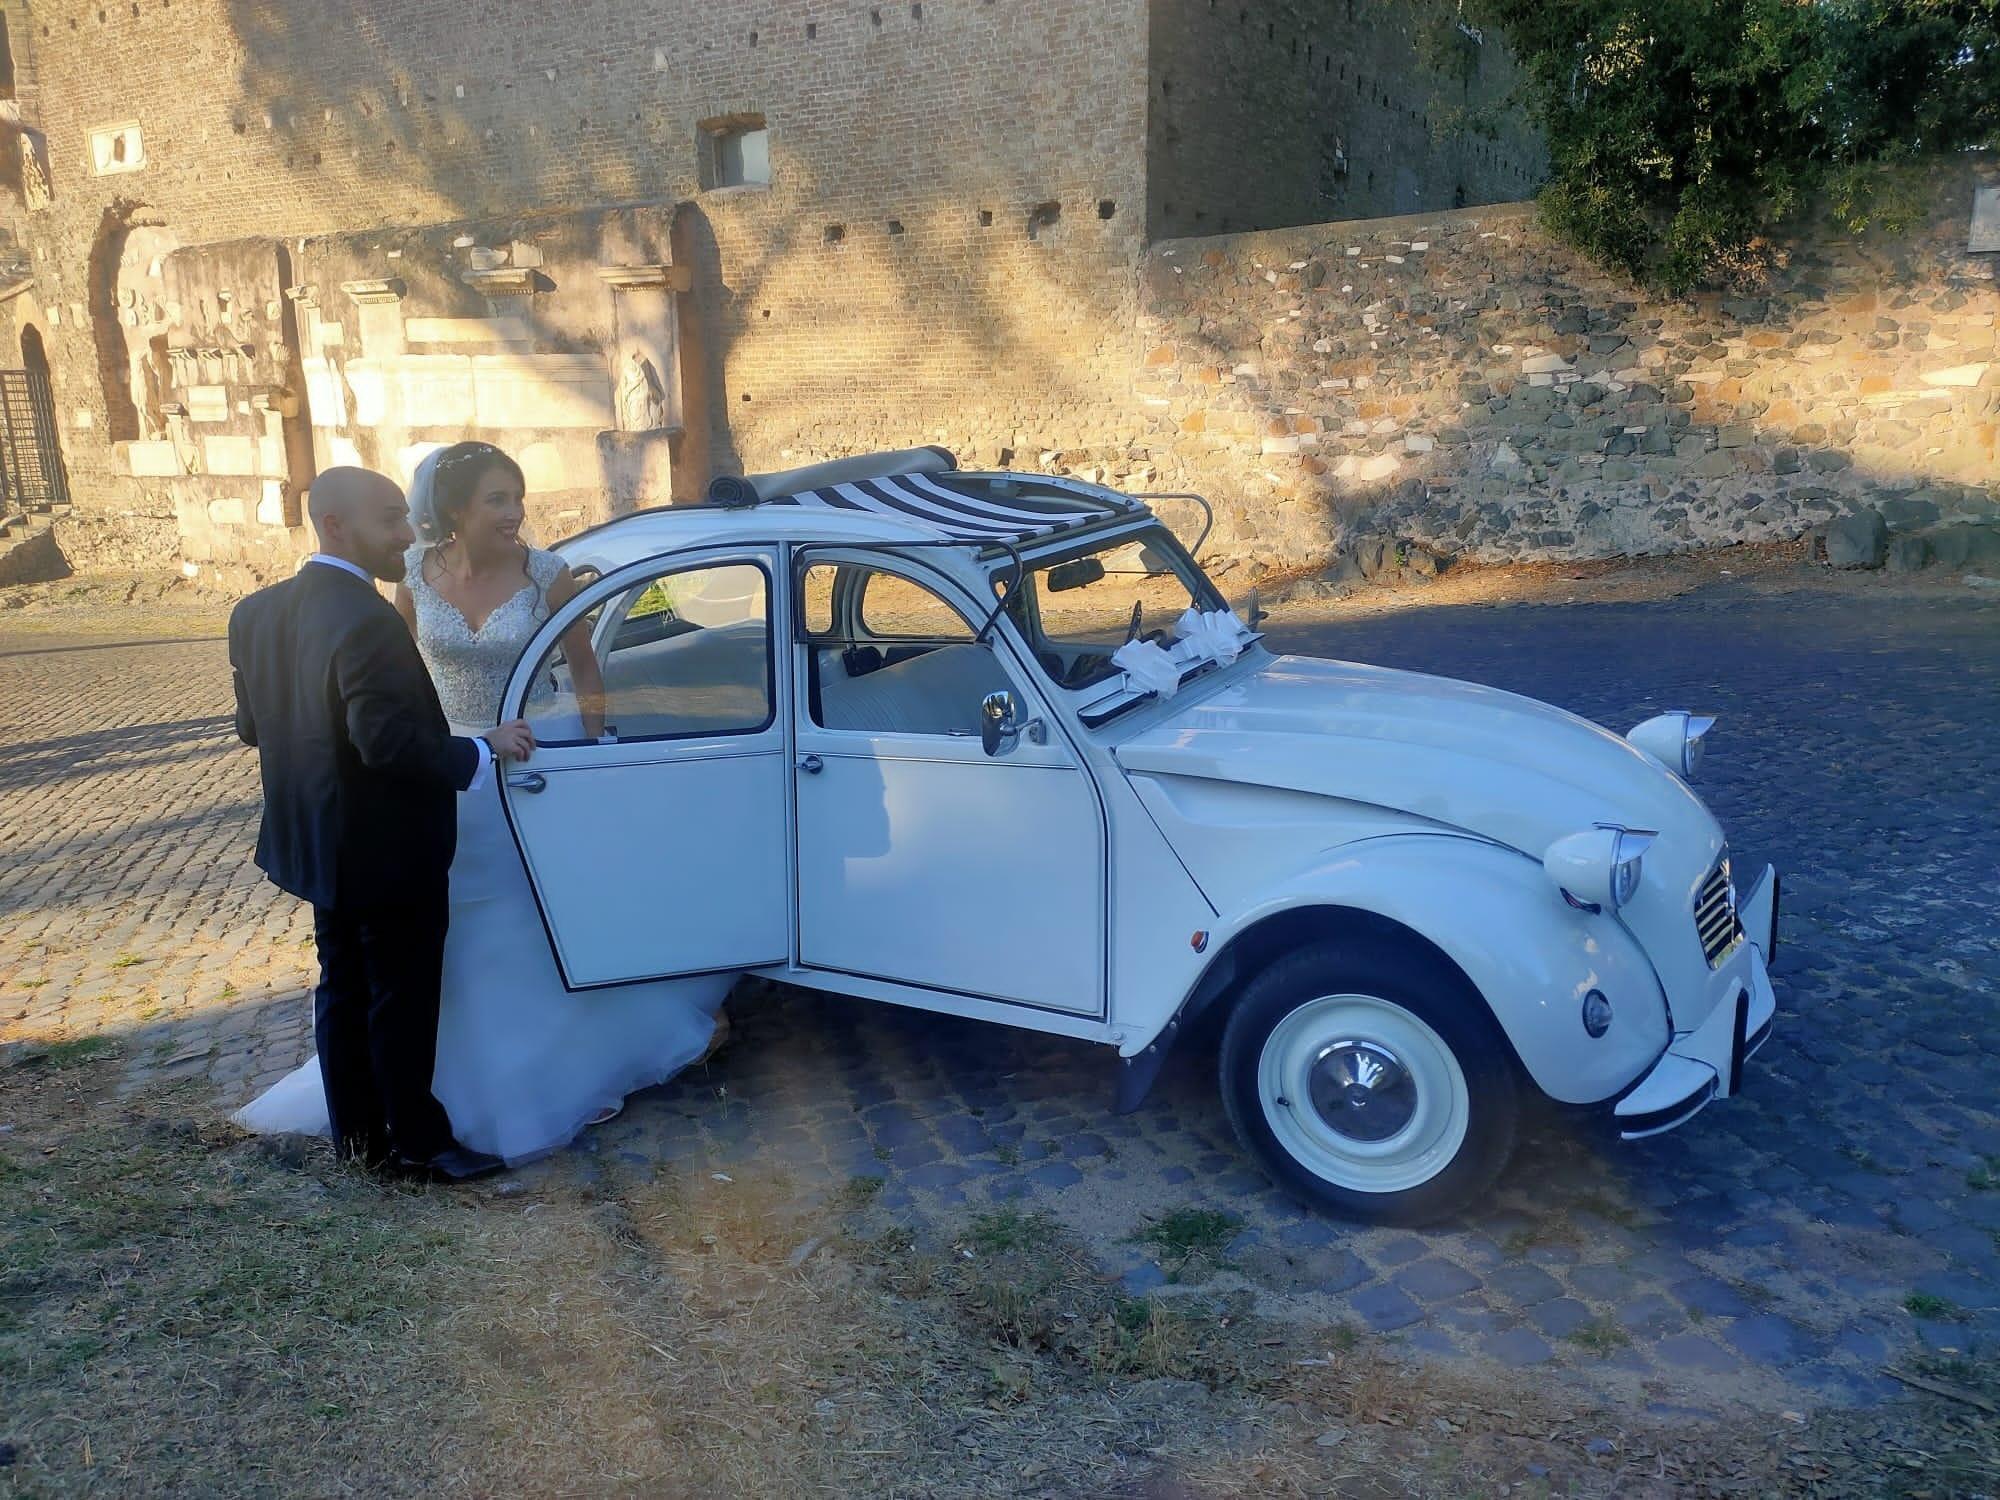 Noleggio auto matrimoni - Citroen 2CV Nozze in bianco - noleggio auto storiche